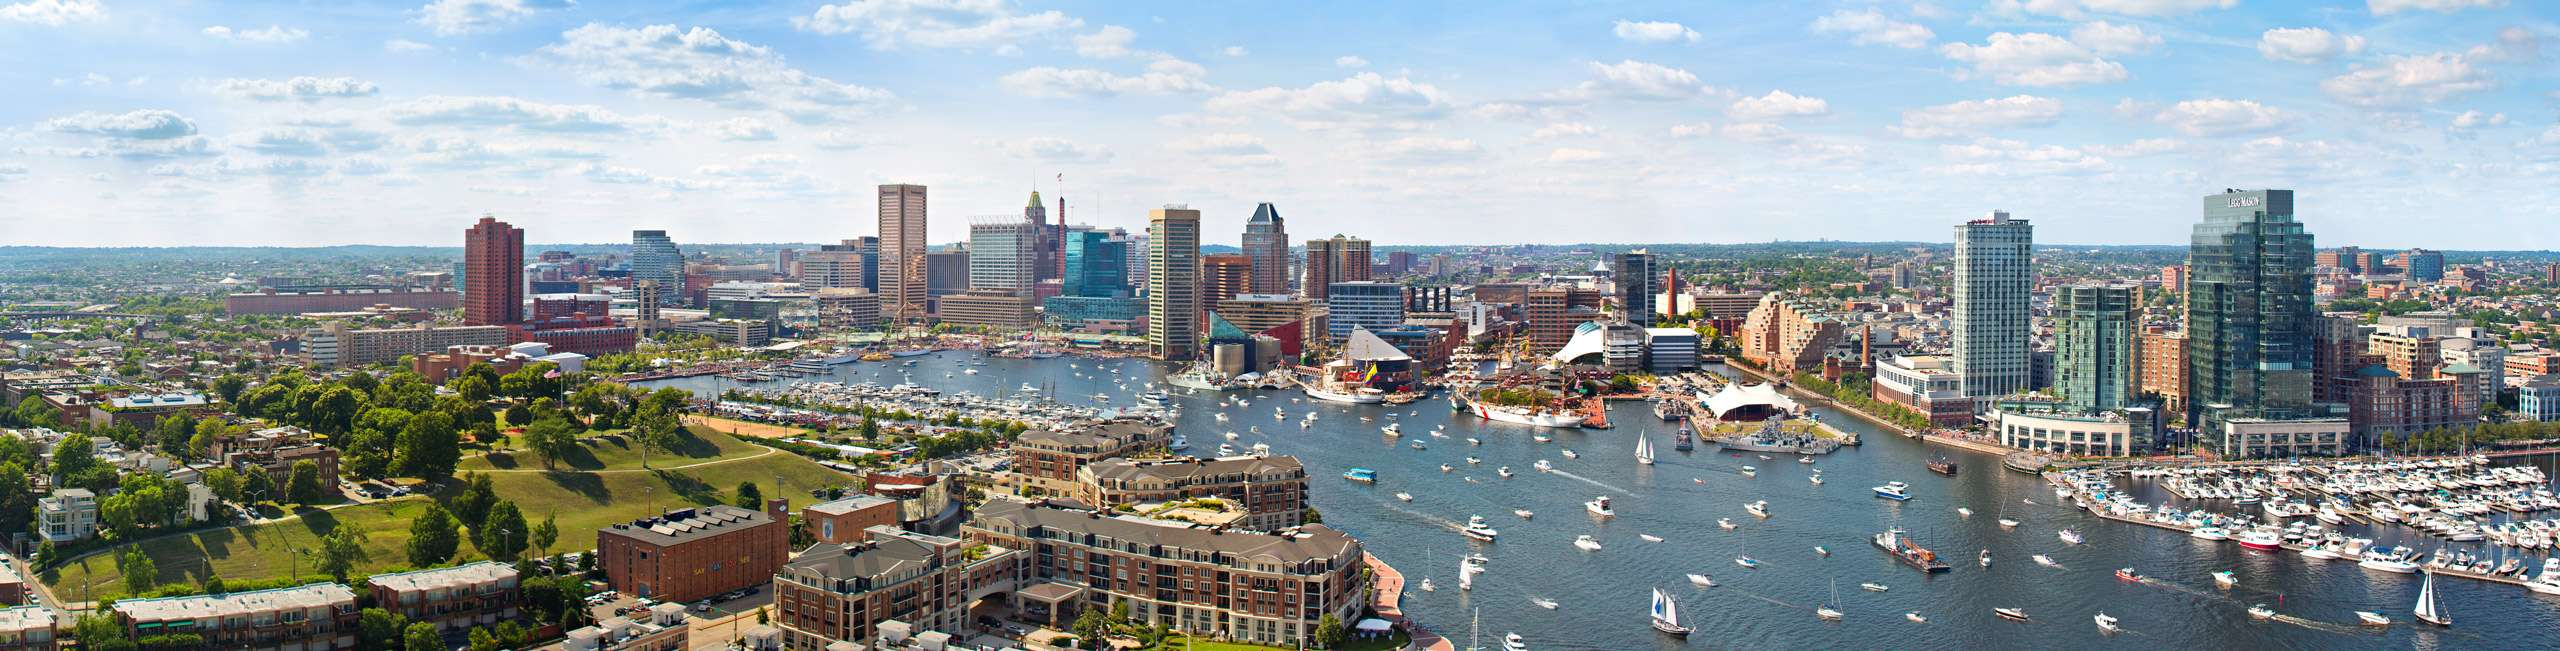 PORTFOLIO - Baltimore - Attractions  #20  PCG672